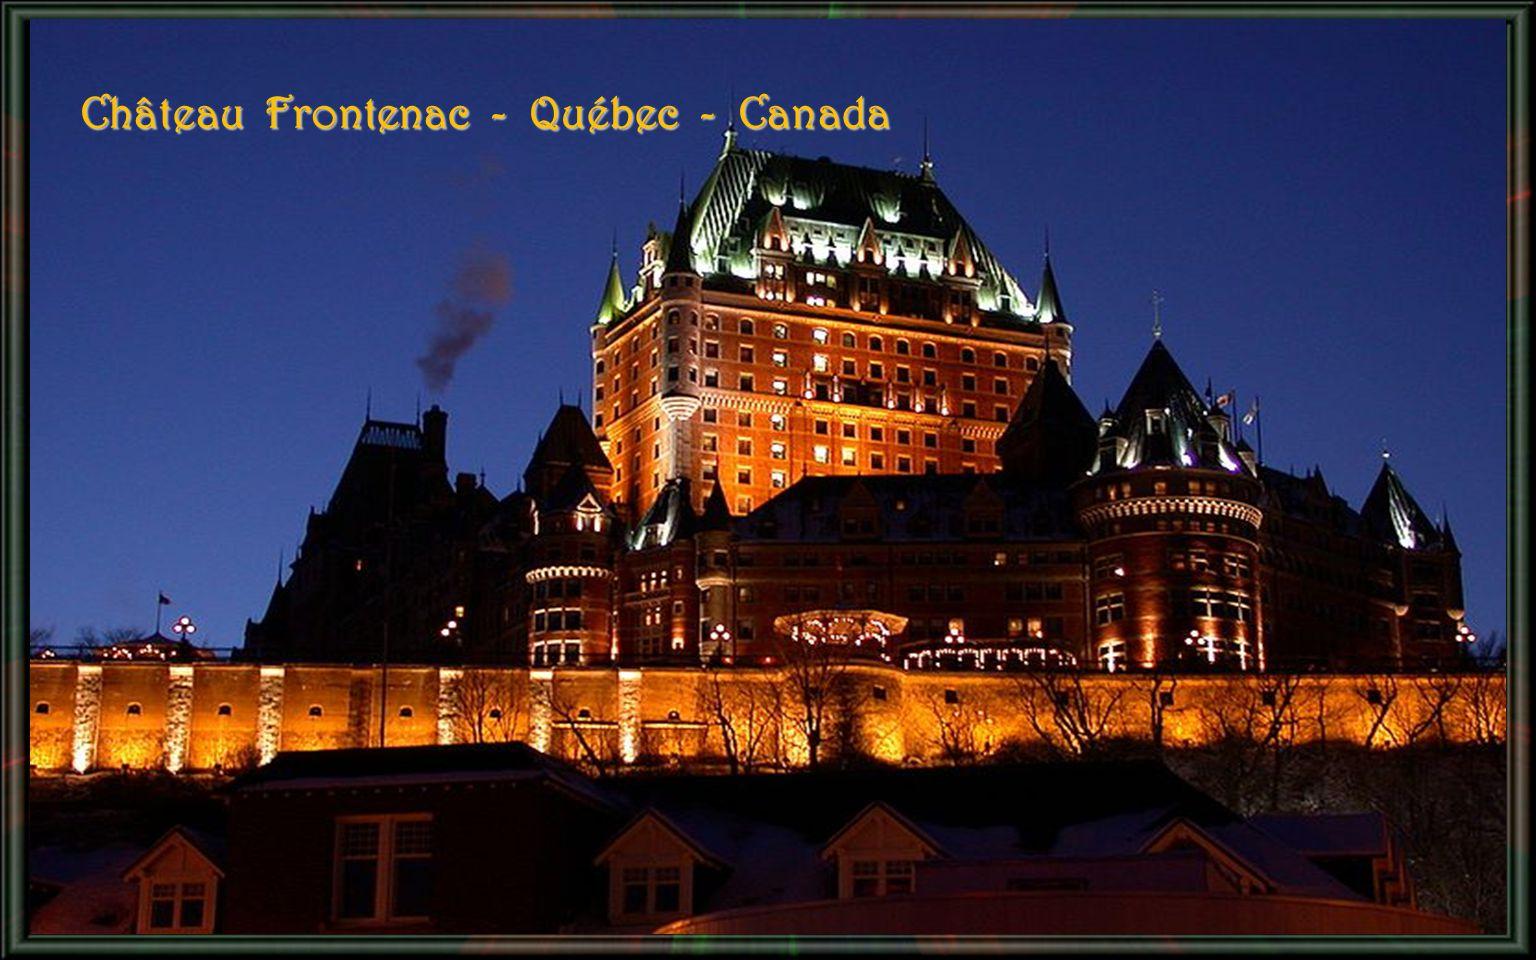 Château Frontenac - Québec - Canada